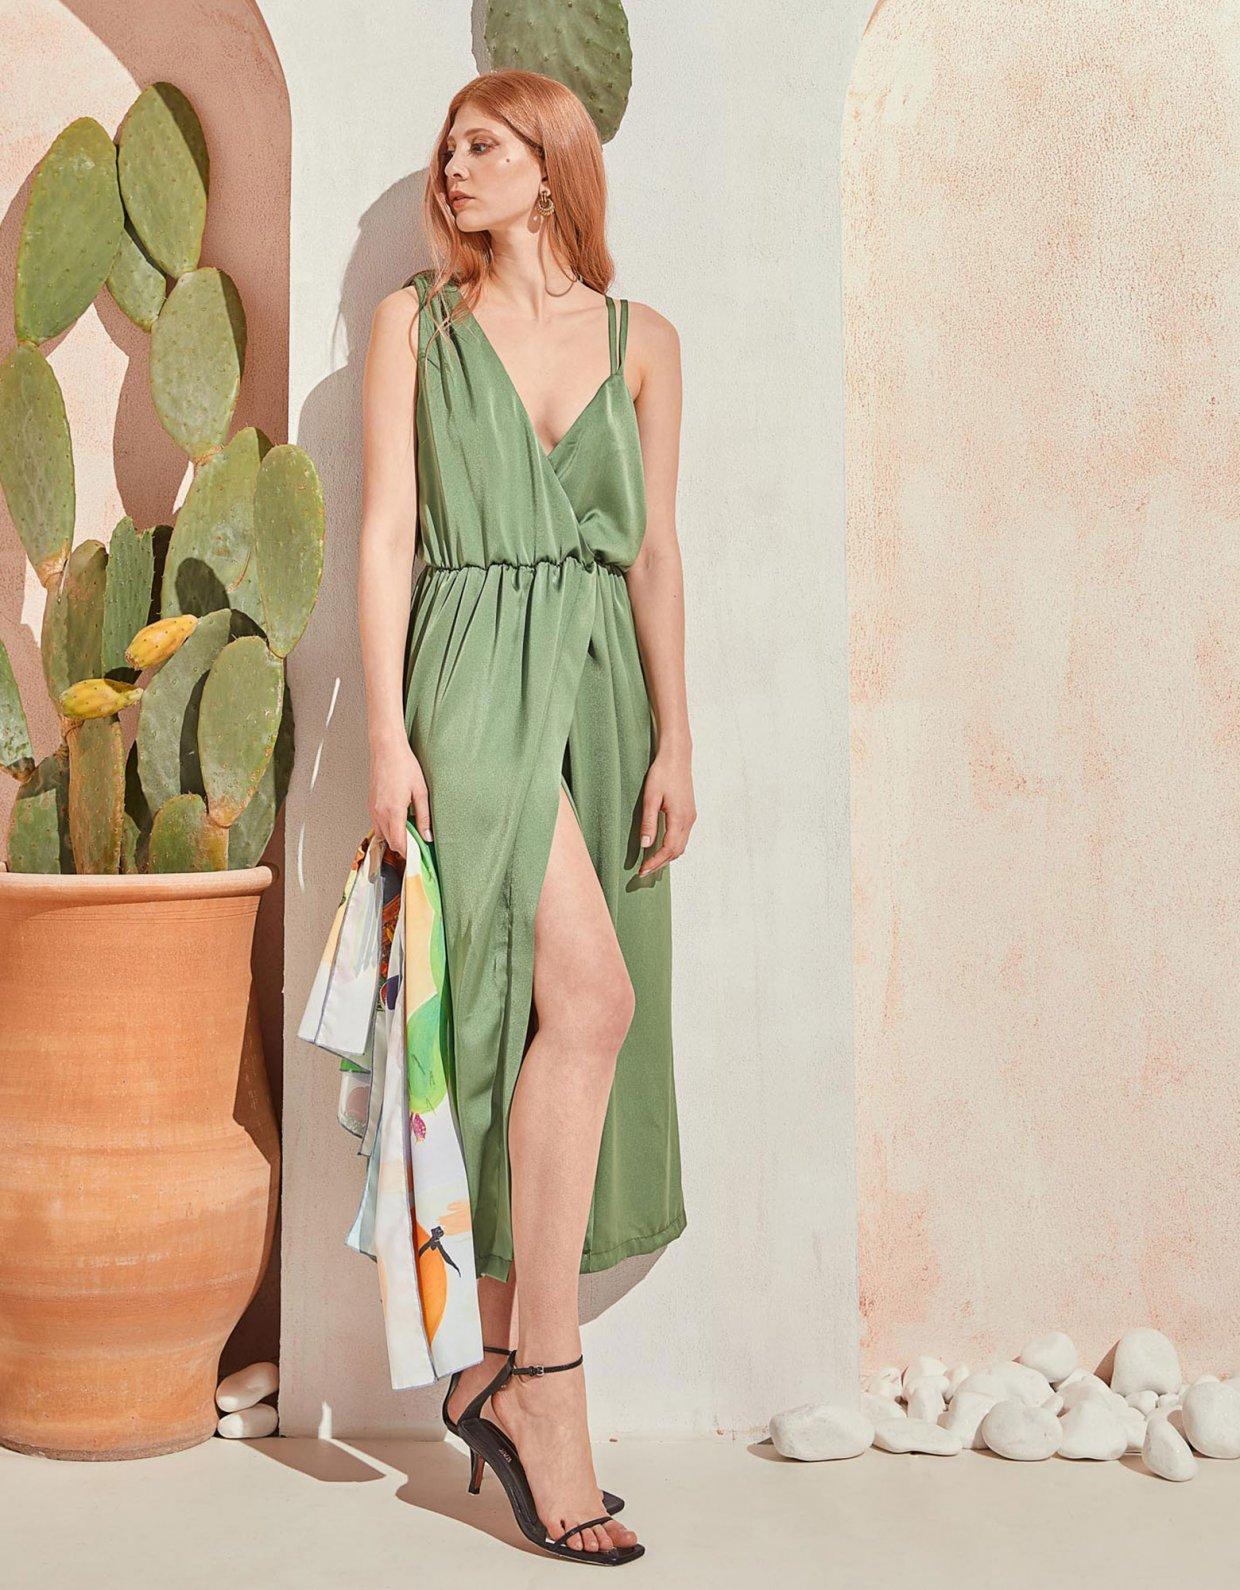 The Knl's Liberty dress green